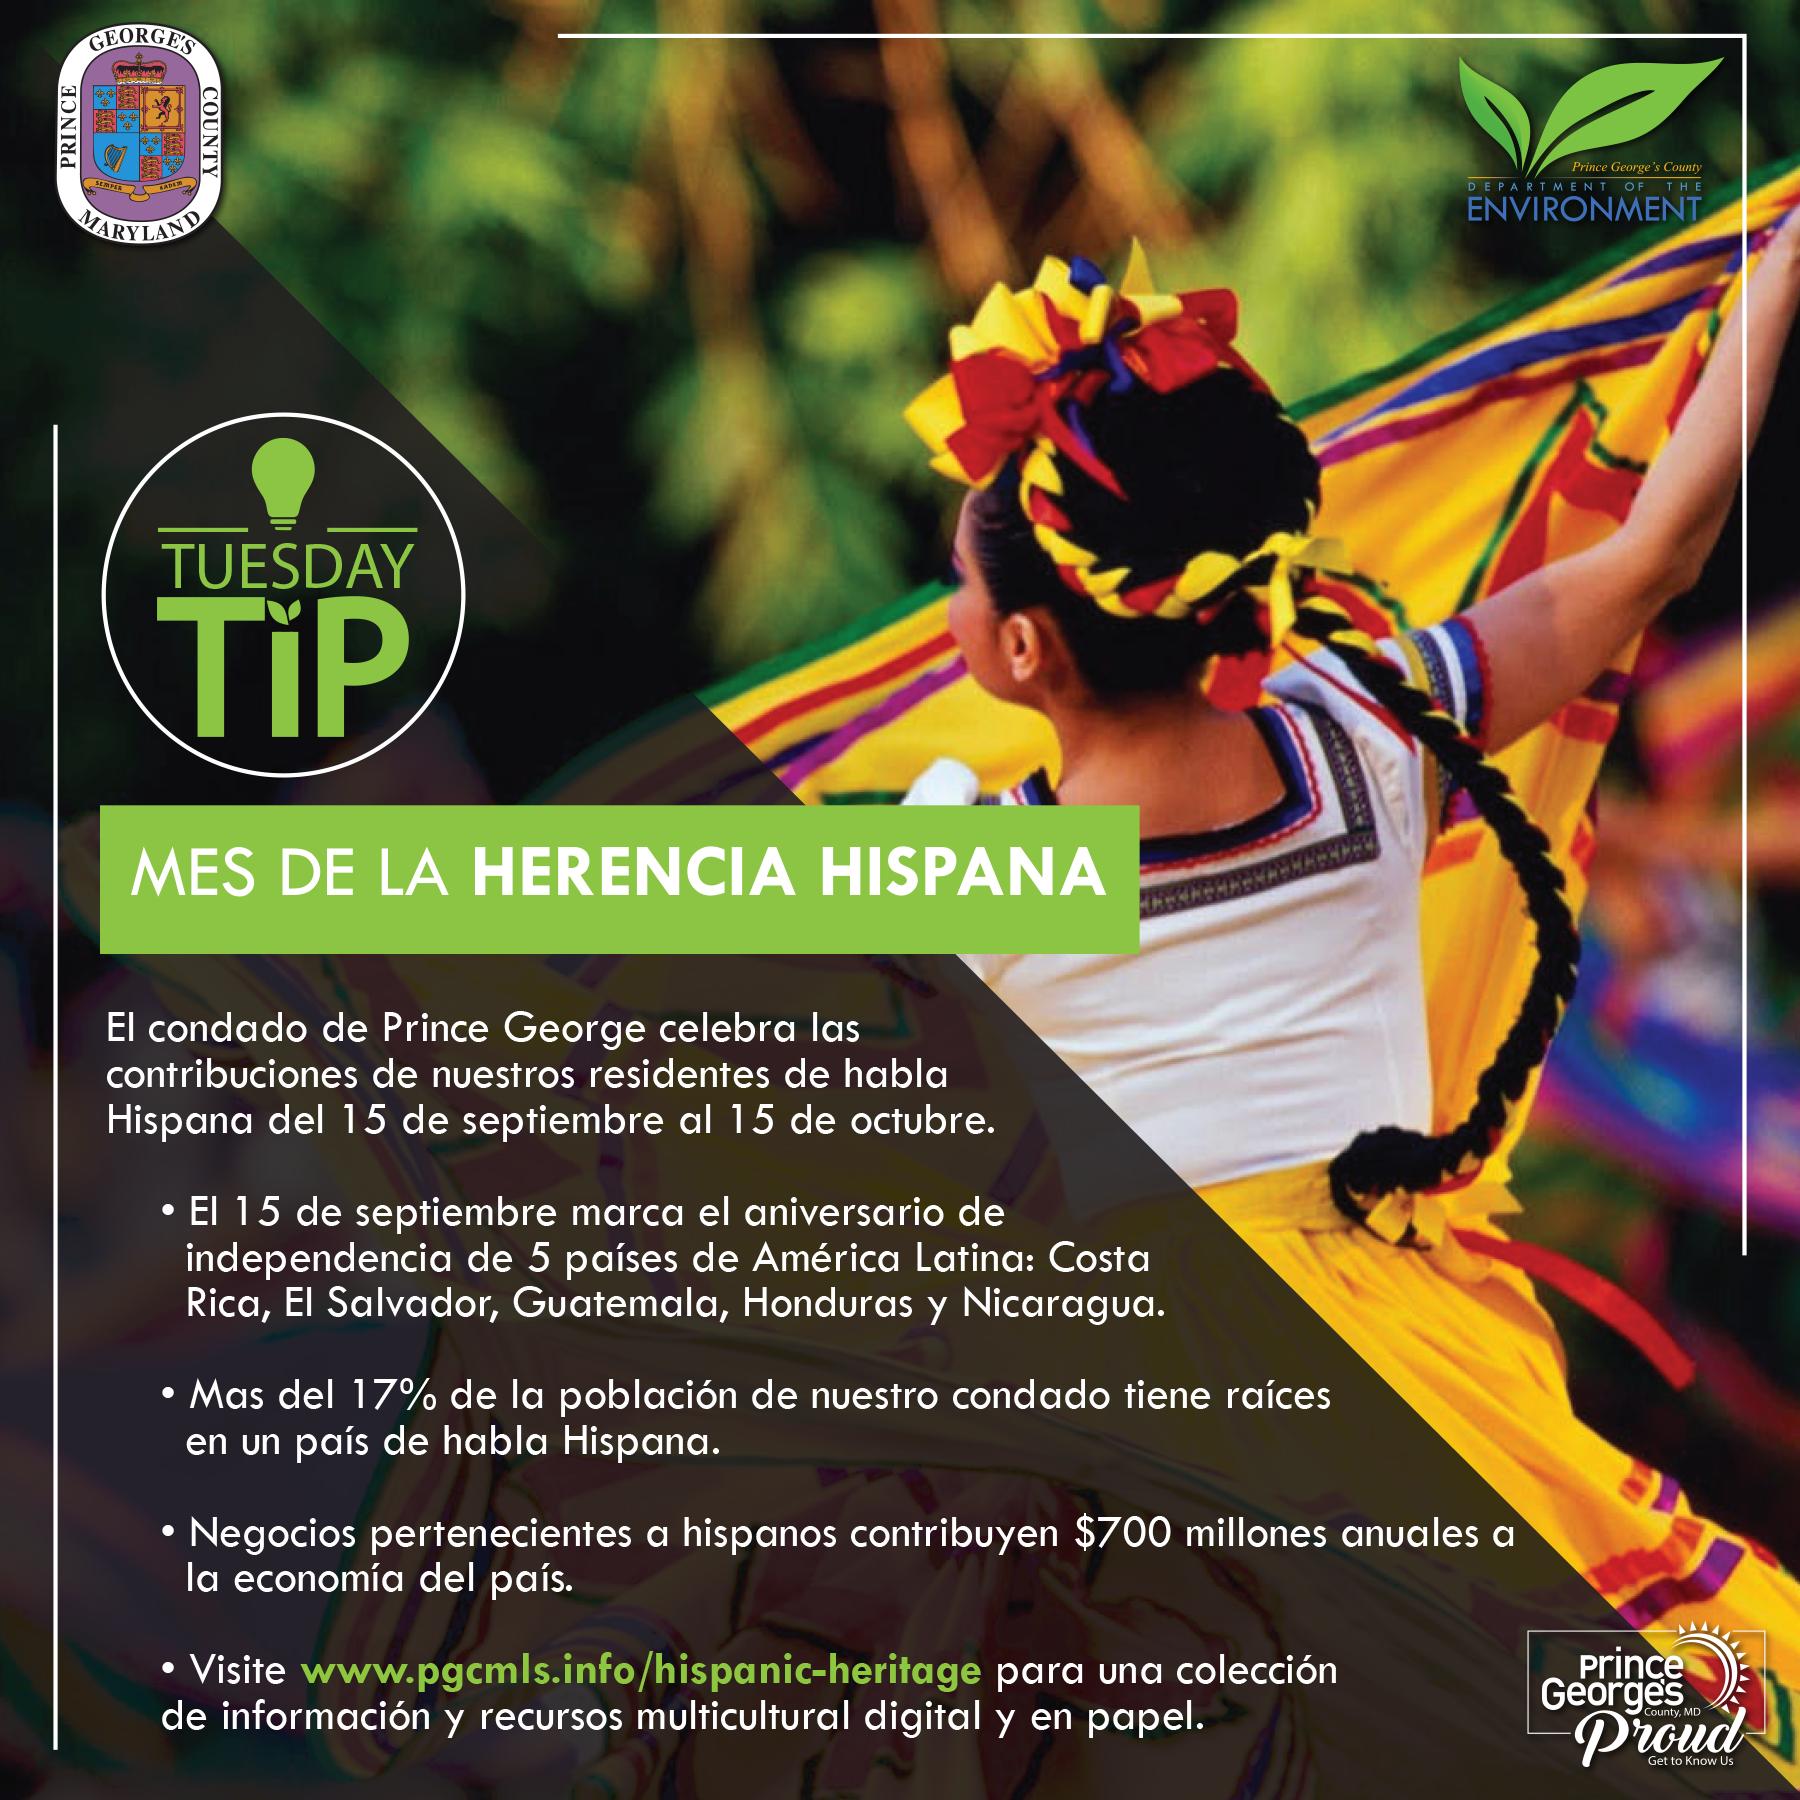 Tues Tip 10.13.20 Hispanic month sp